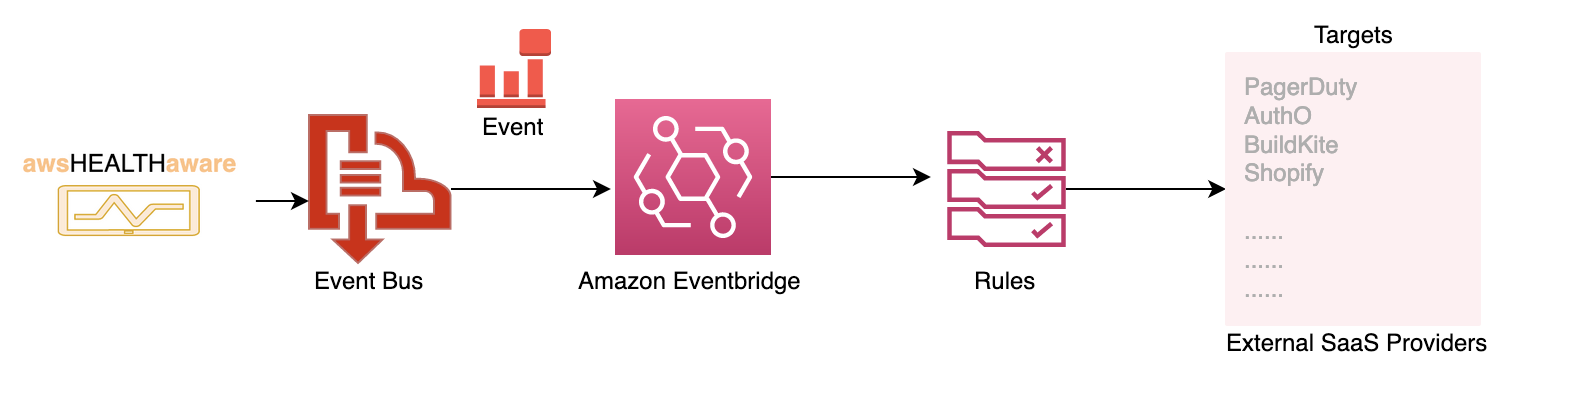 Diagram shows Event bus and Amazon Eventbridge sending to External SaaS providers.